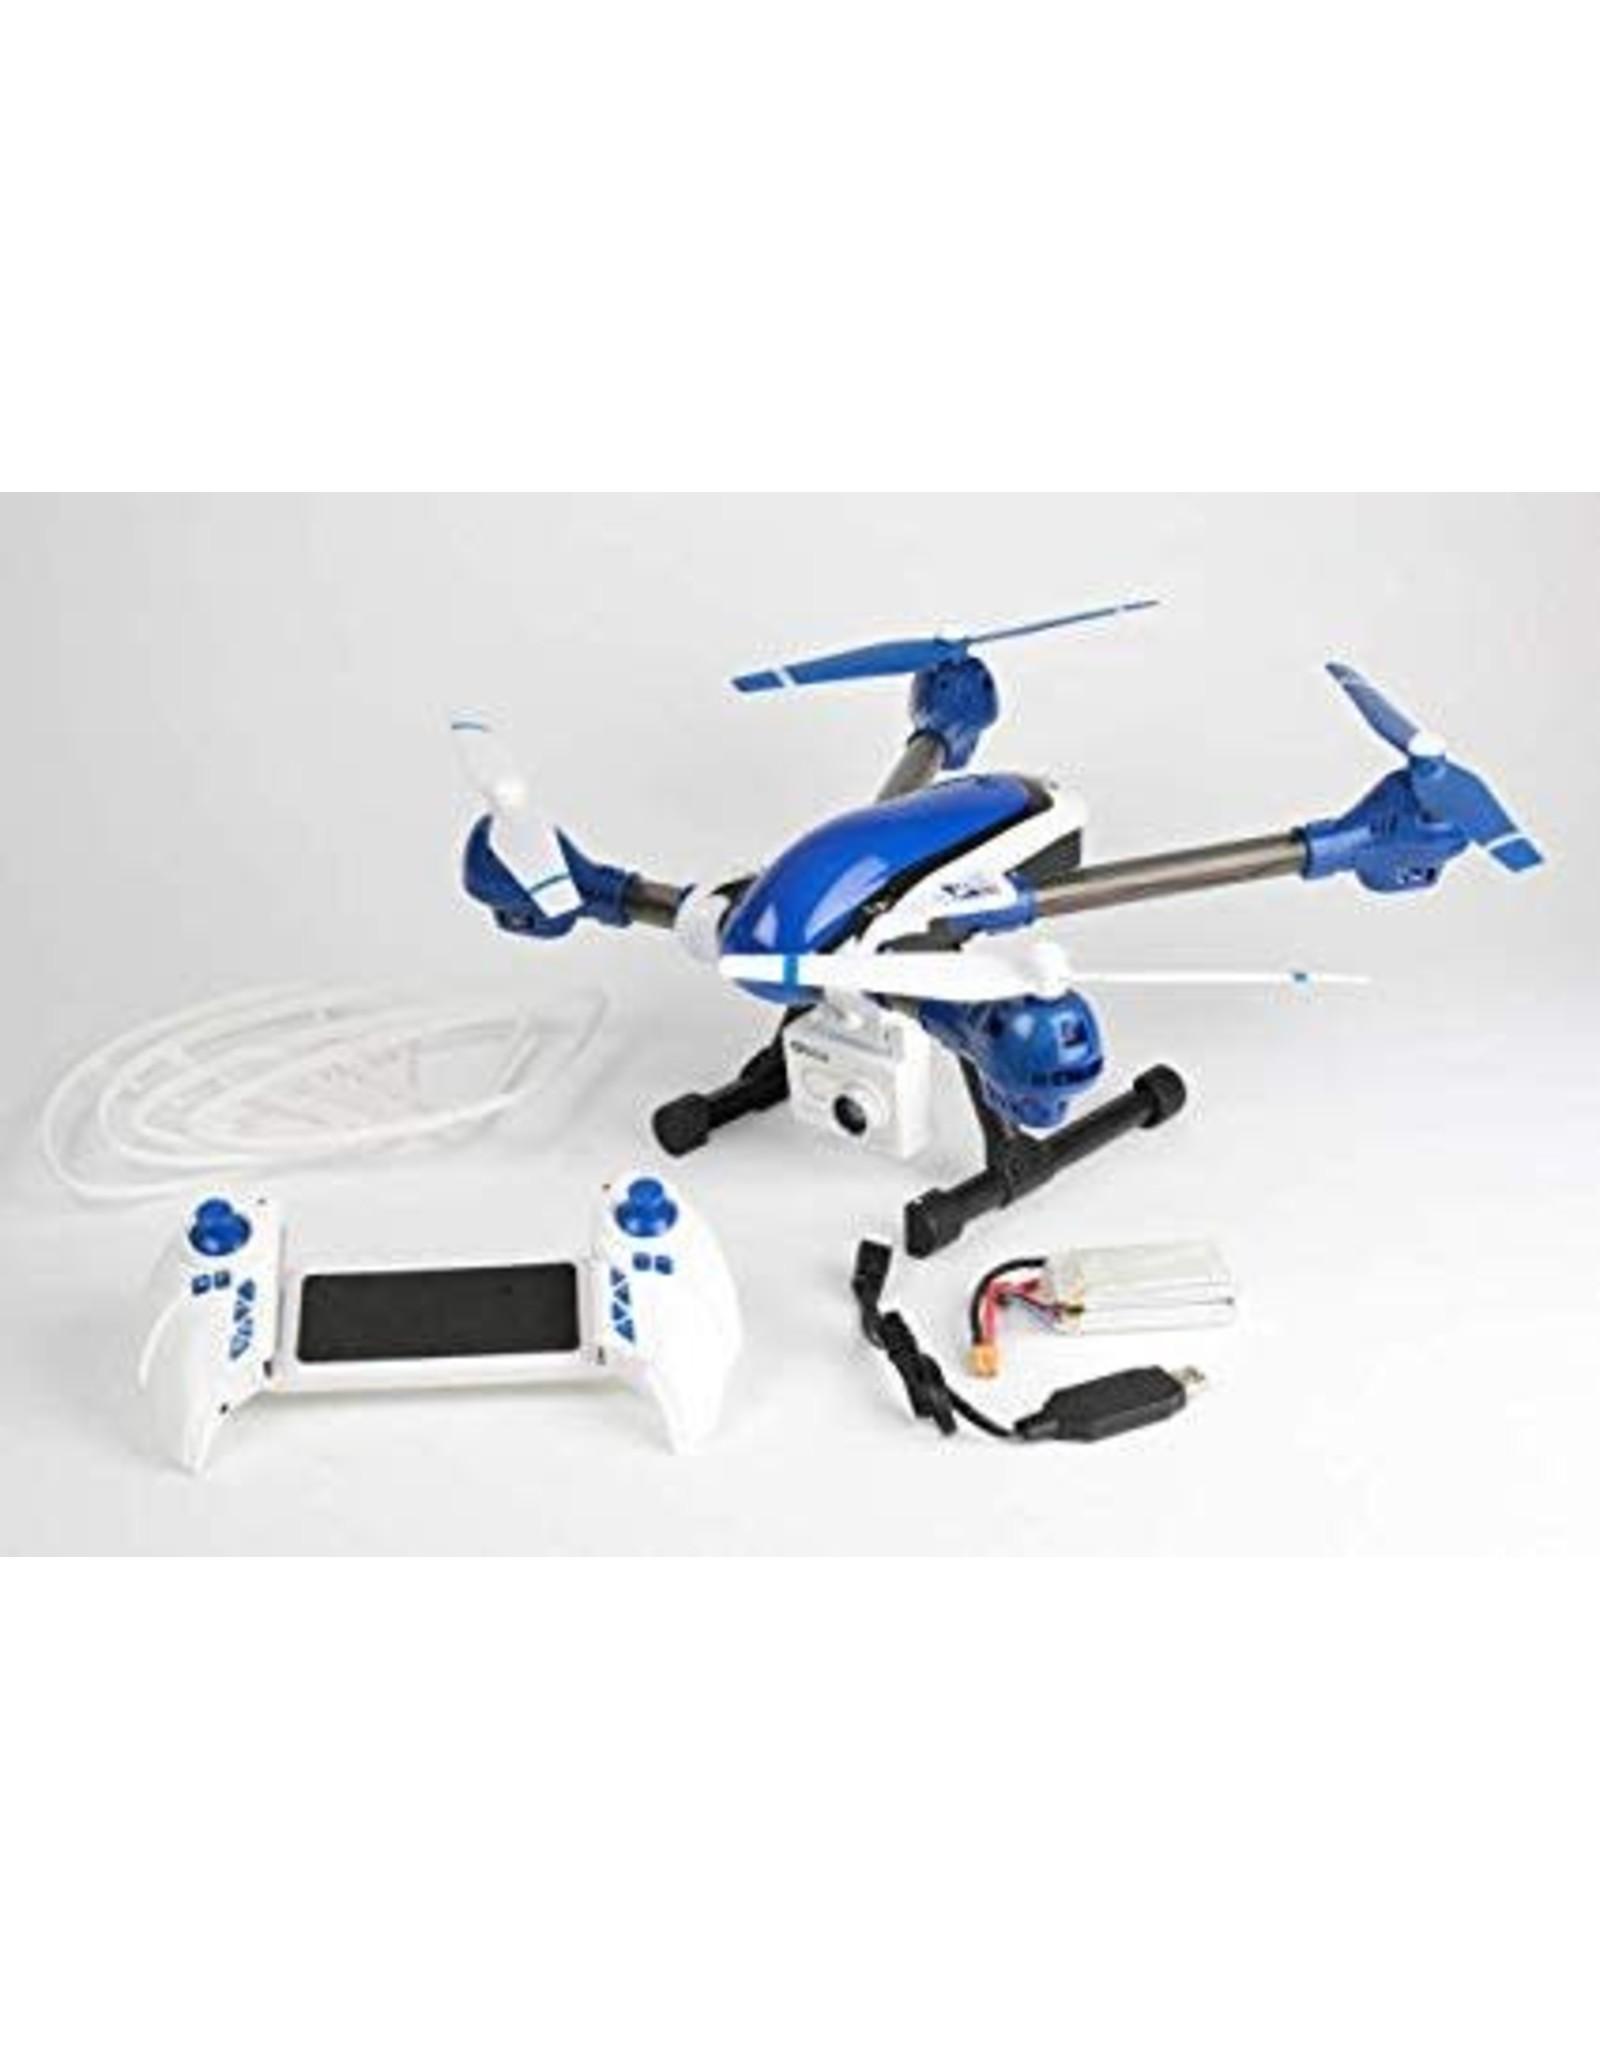 Rage R/C Imager 390 FPV RTF Drone